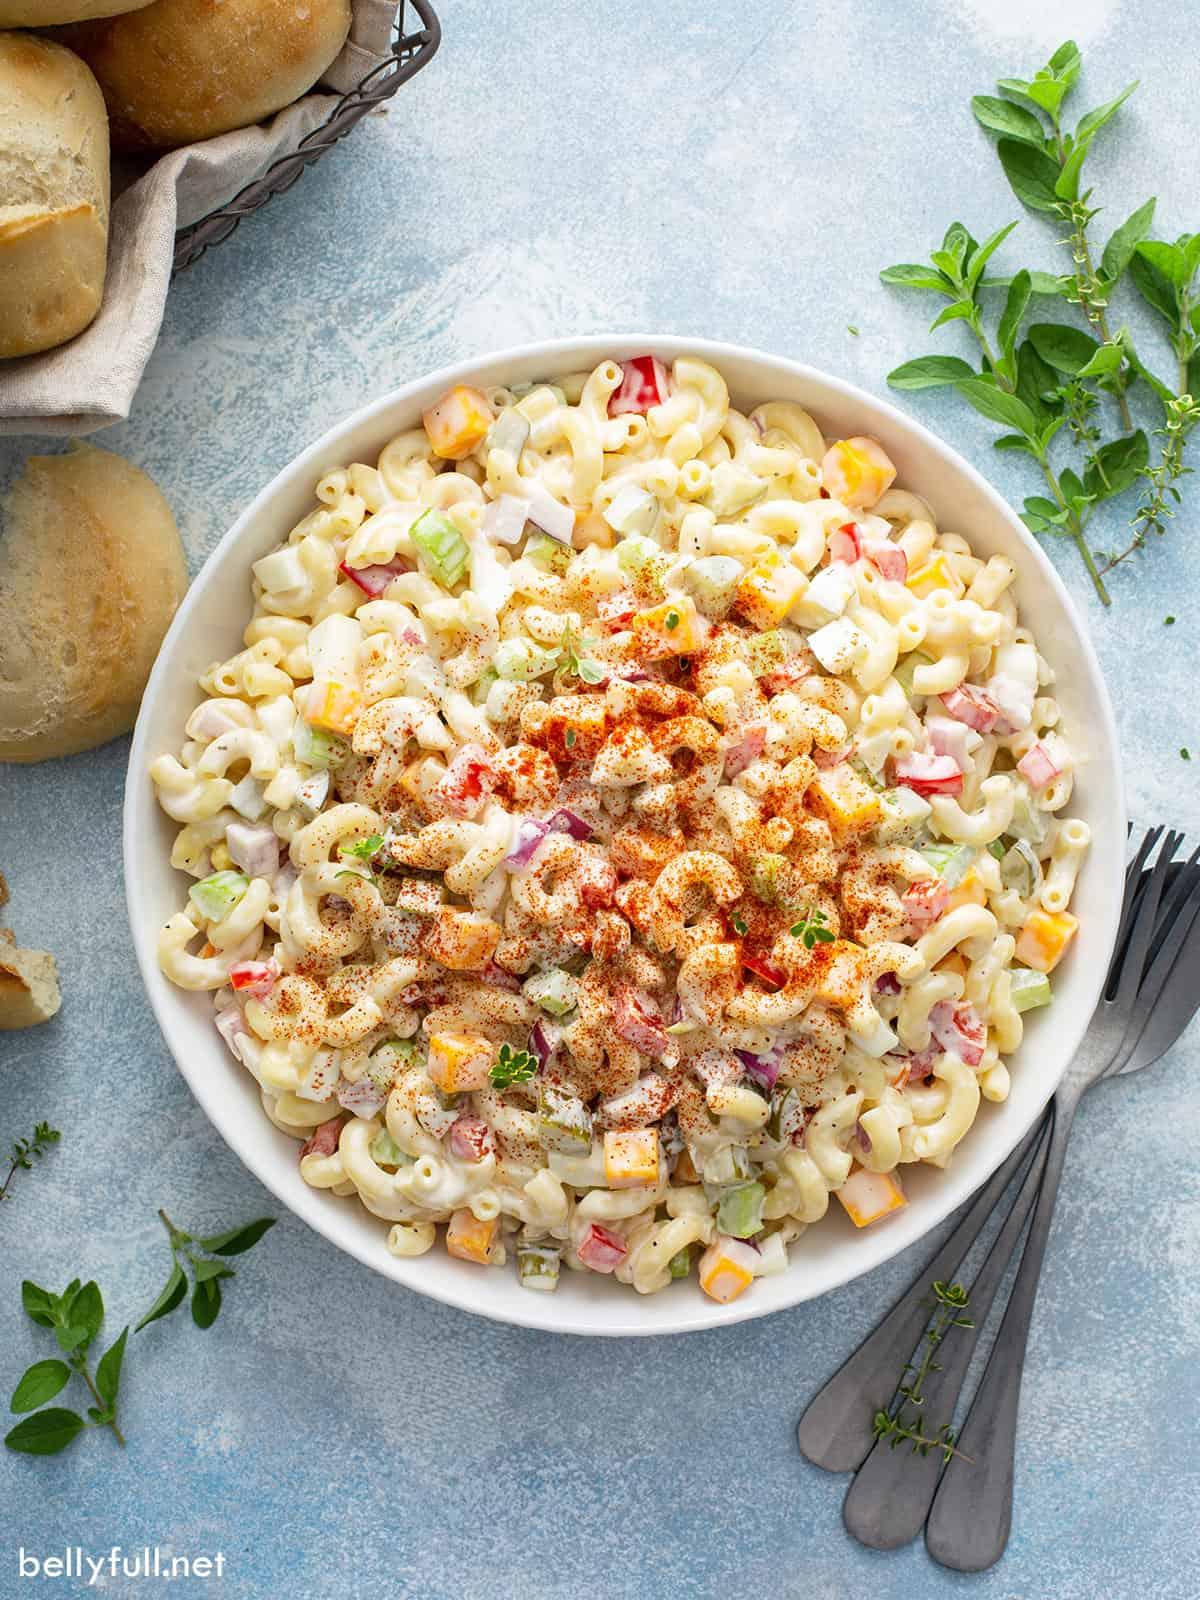 A big bowl of old fashioned macaroni salad